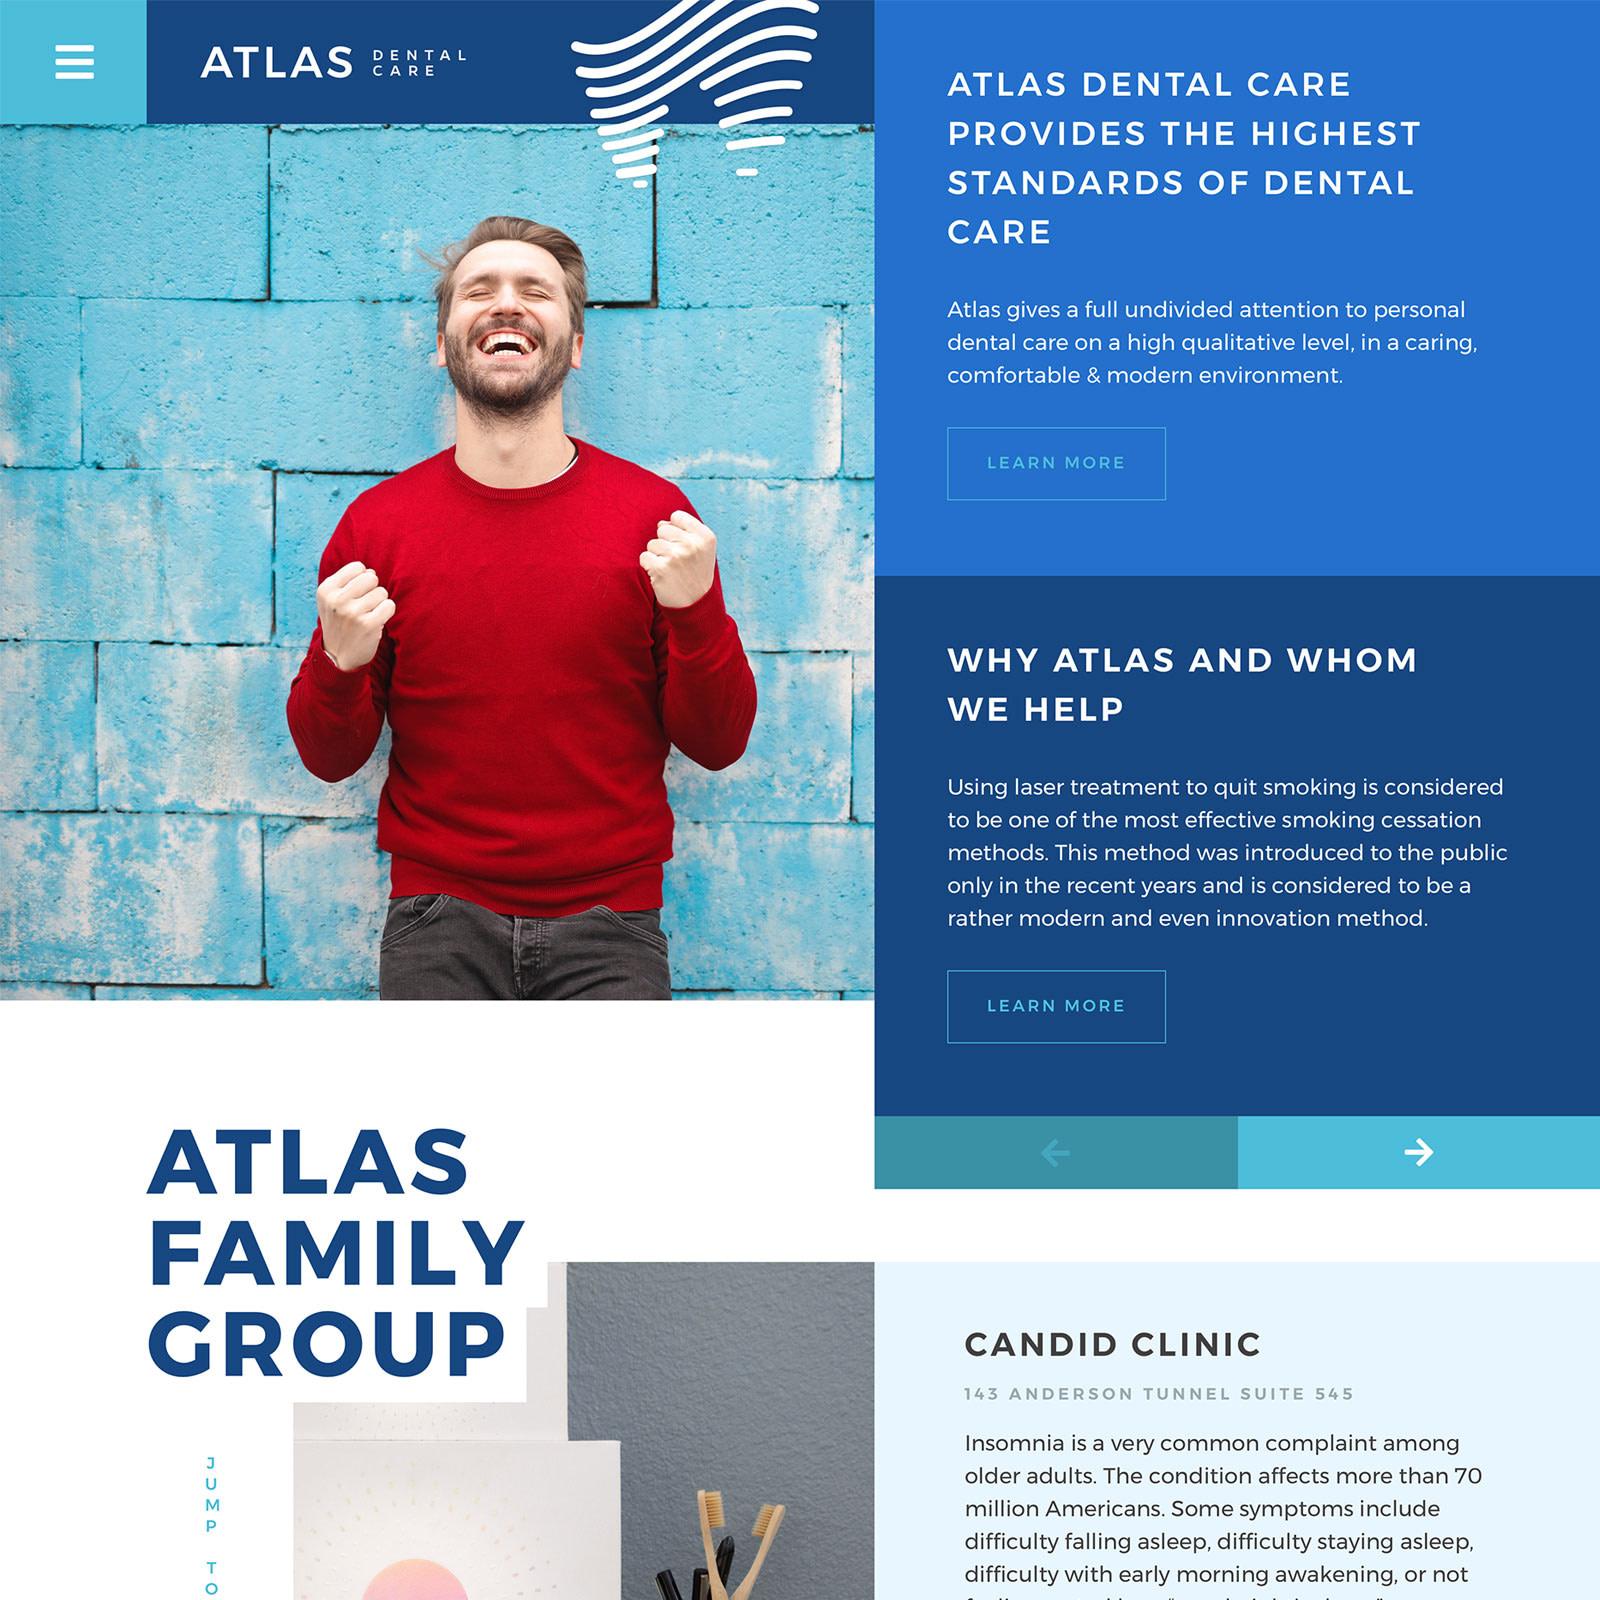 Dental acquiring company web design concept/proposal